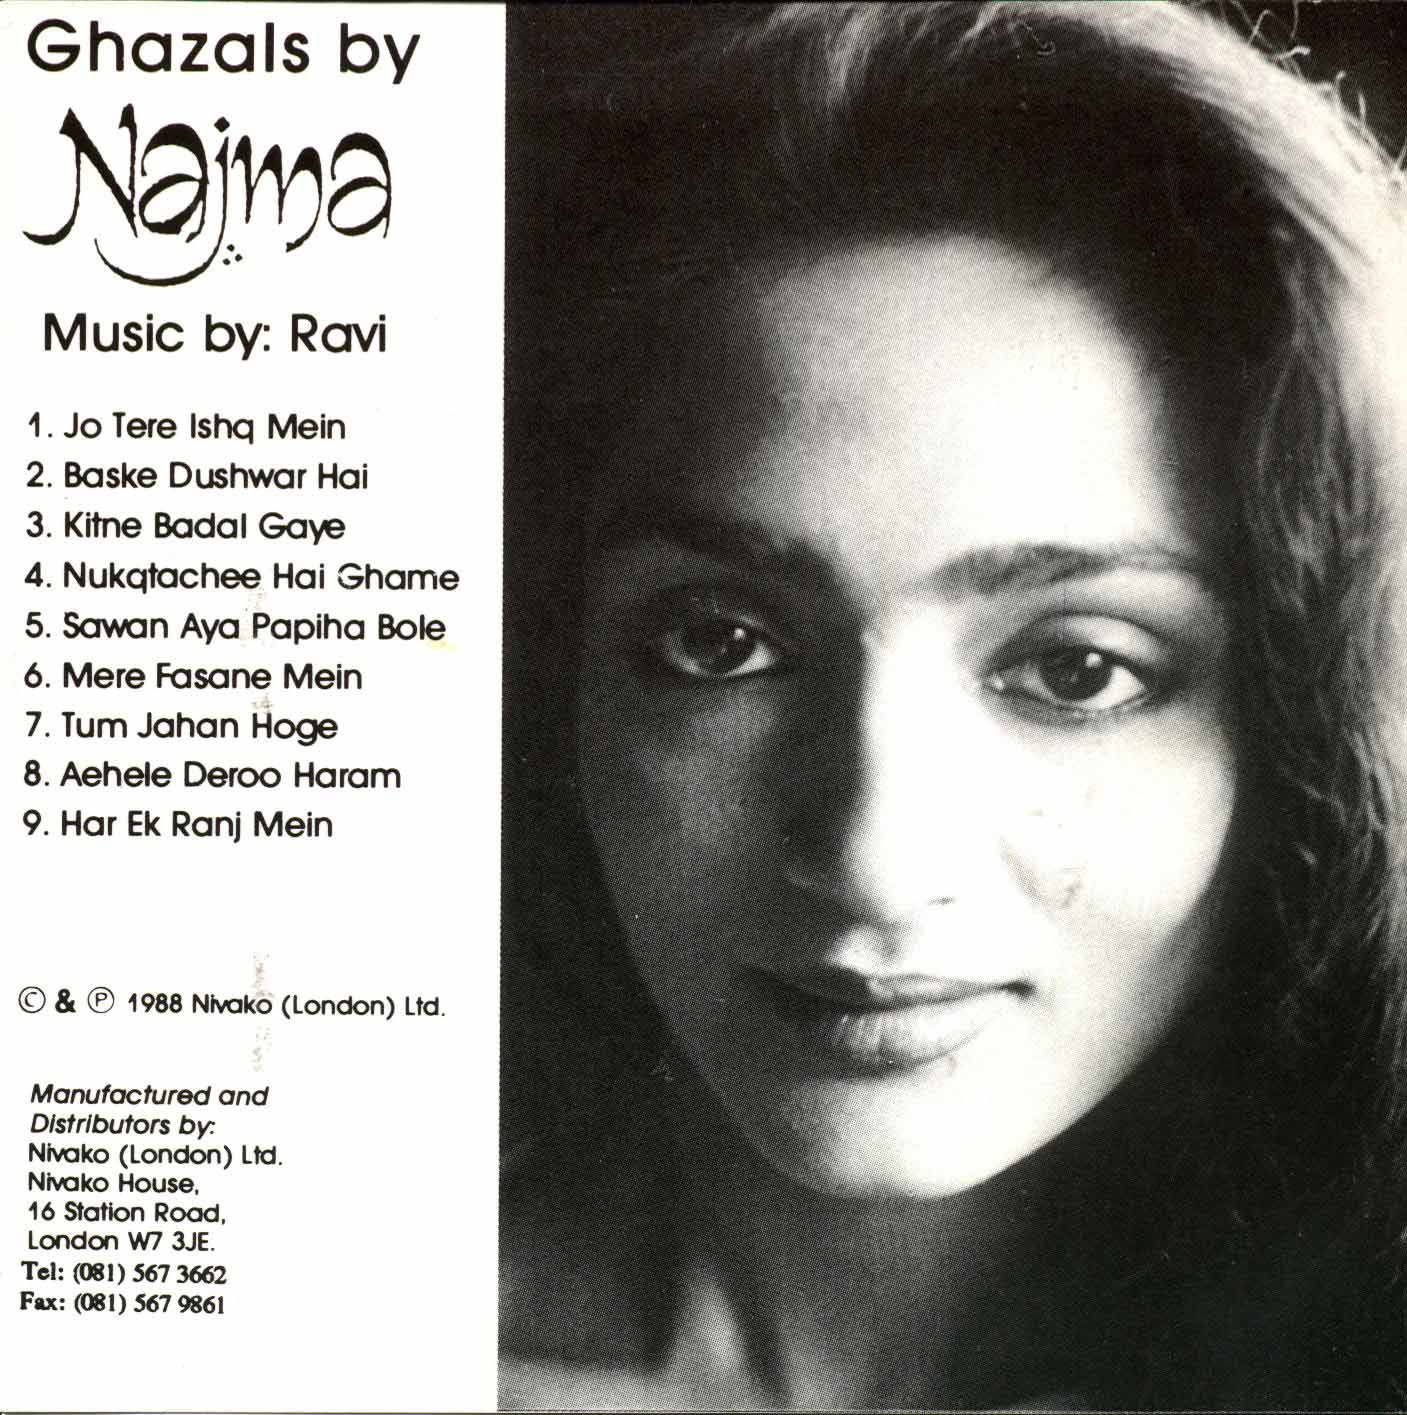 NAJMA - Ghazals by Najma